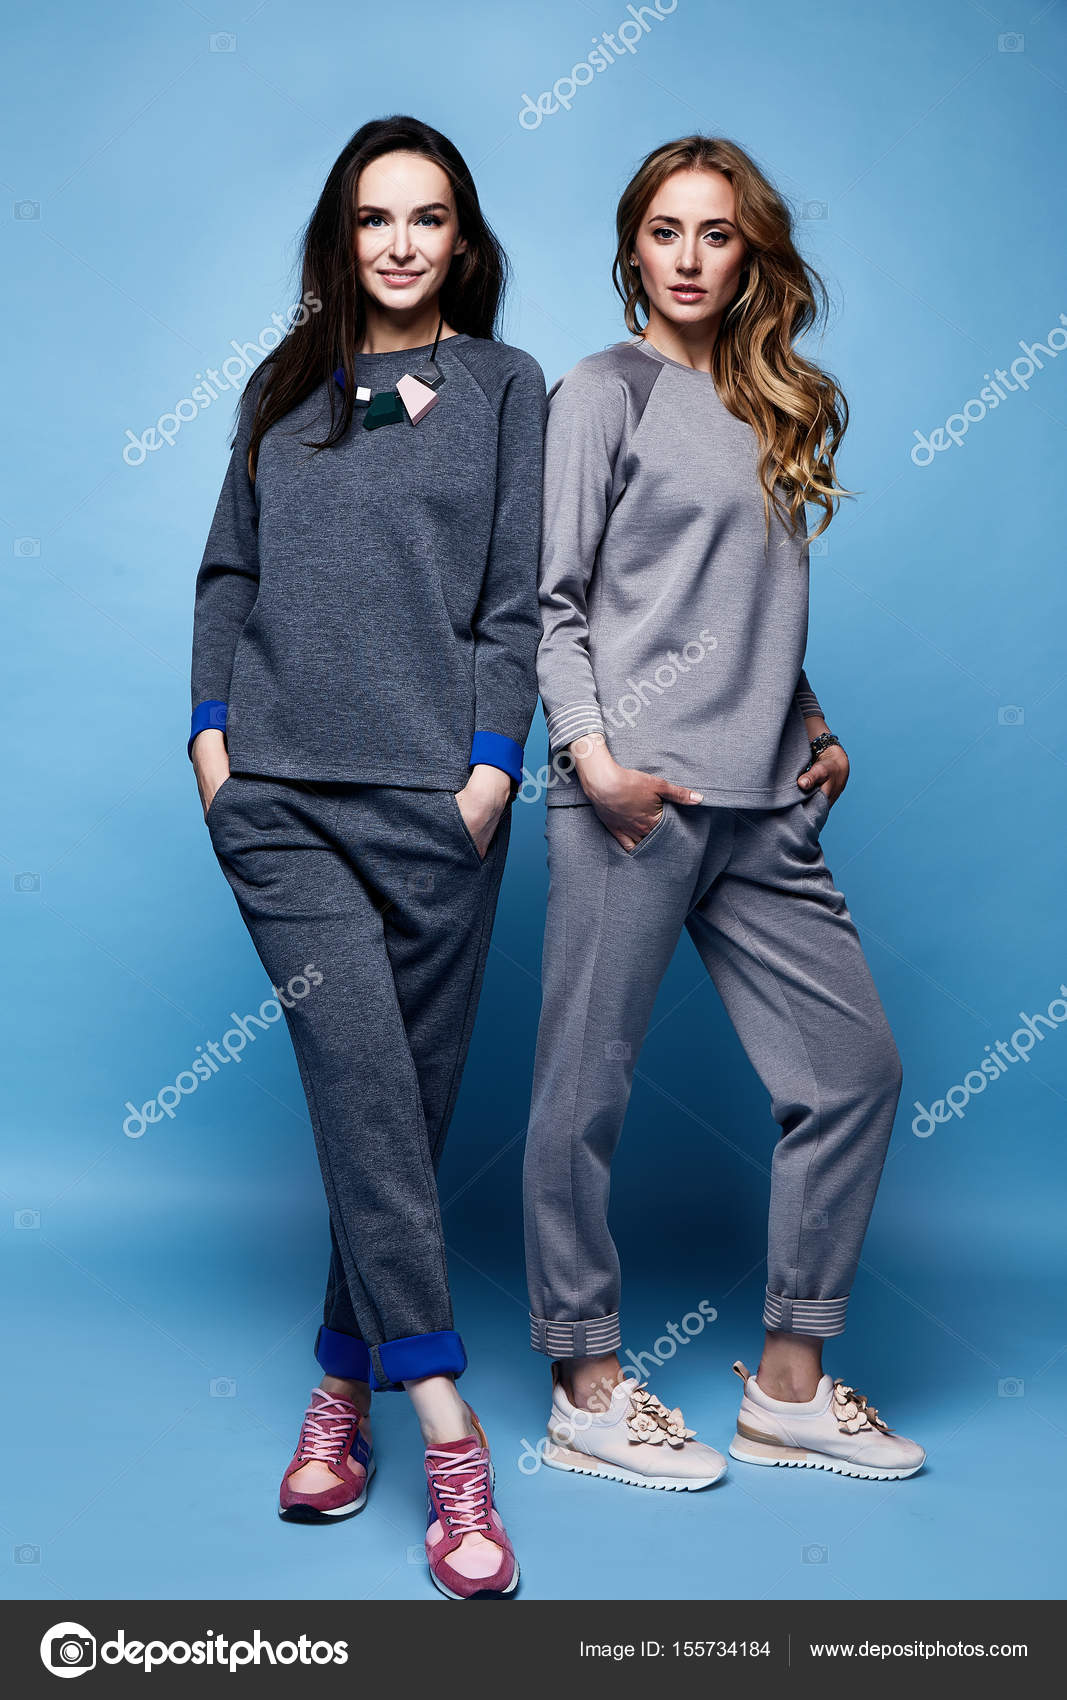 cd9ddddcd4ca Δύο όμορφη γυναίκα σέξι ρούχα casual κοστούμι πουκάμισο και παντελόνι tre–  εικόνα αρχείου